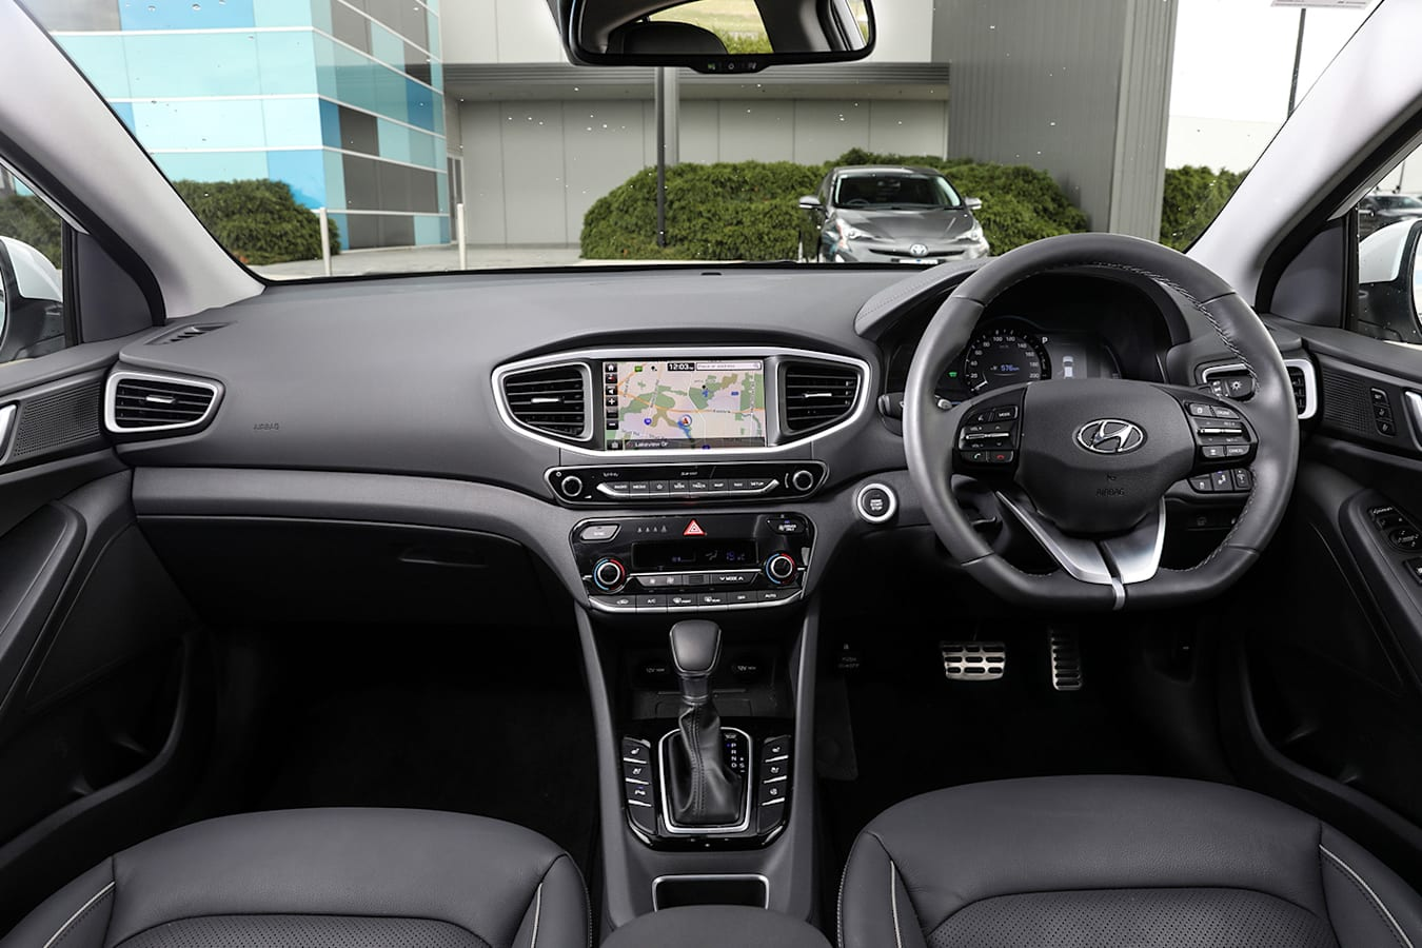 Hyundai Toyota Hyundai Inteiror Jpg